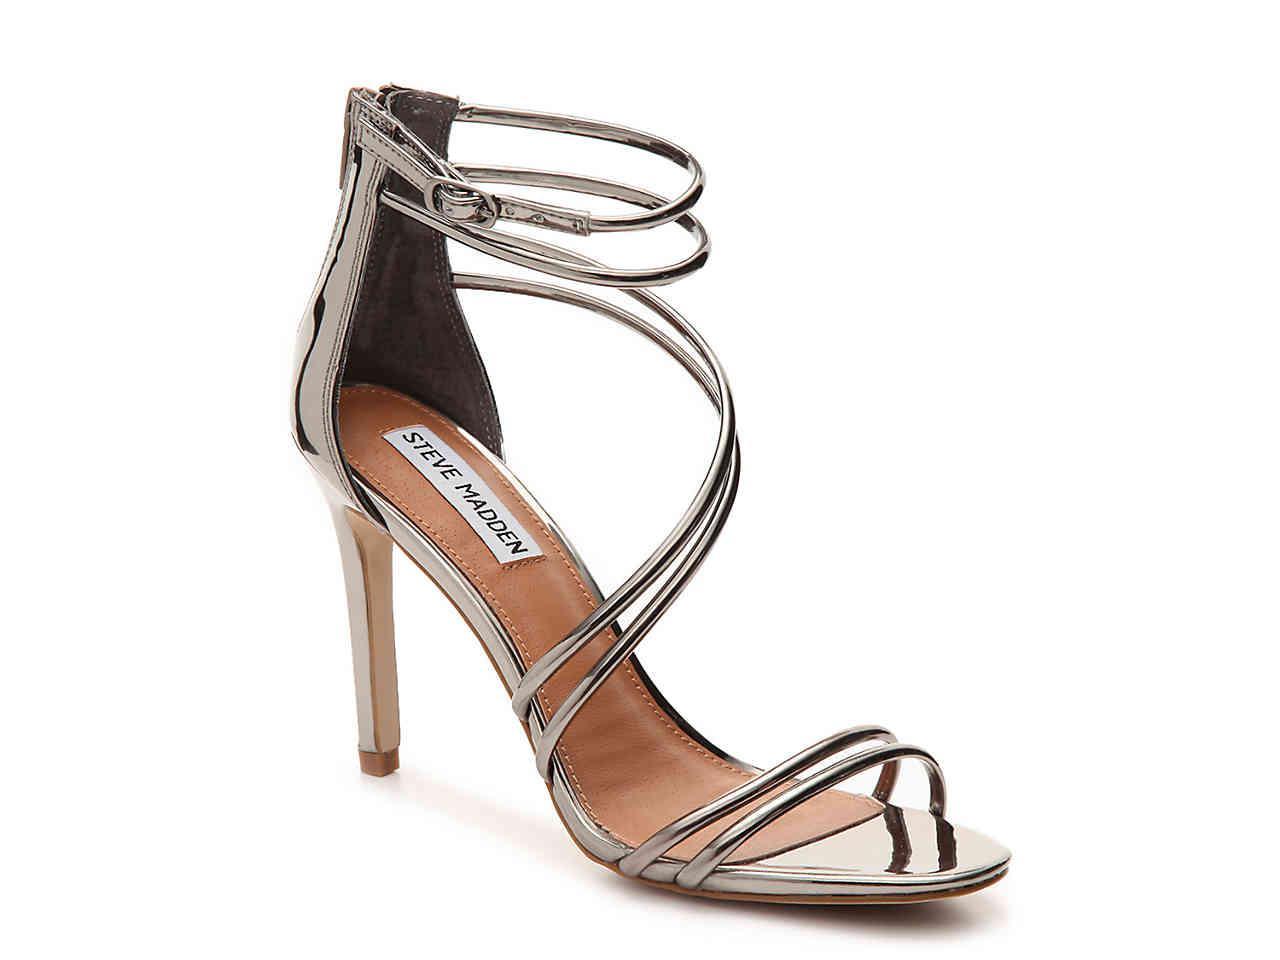 e2a1f672f97 Lyst - Steve Madden Fico Sandal in Metallic